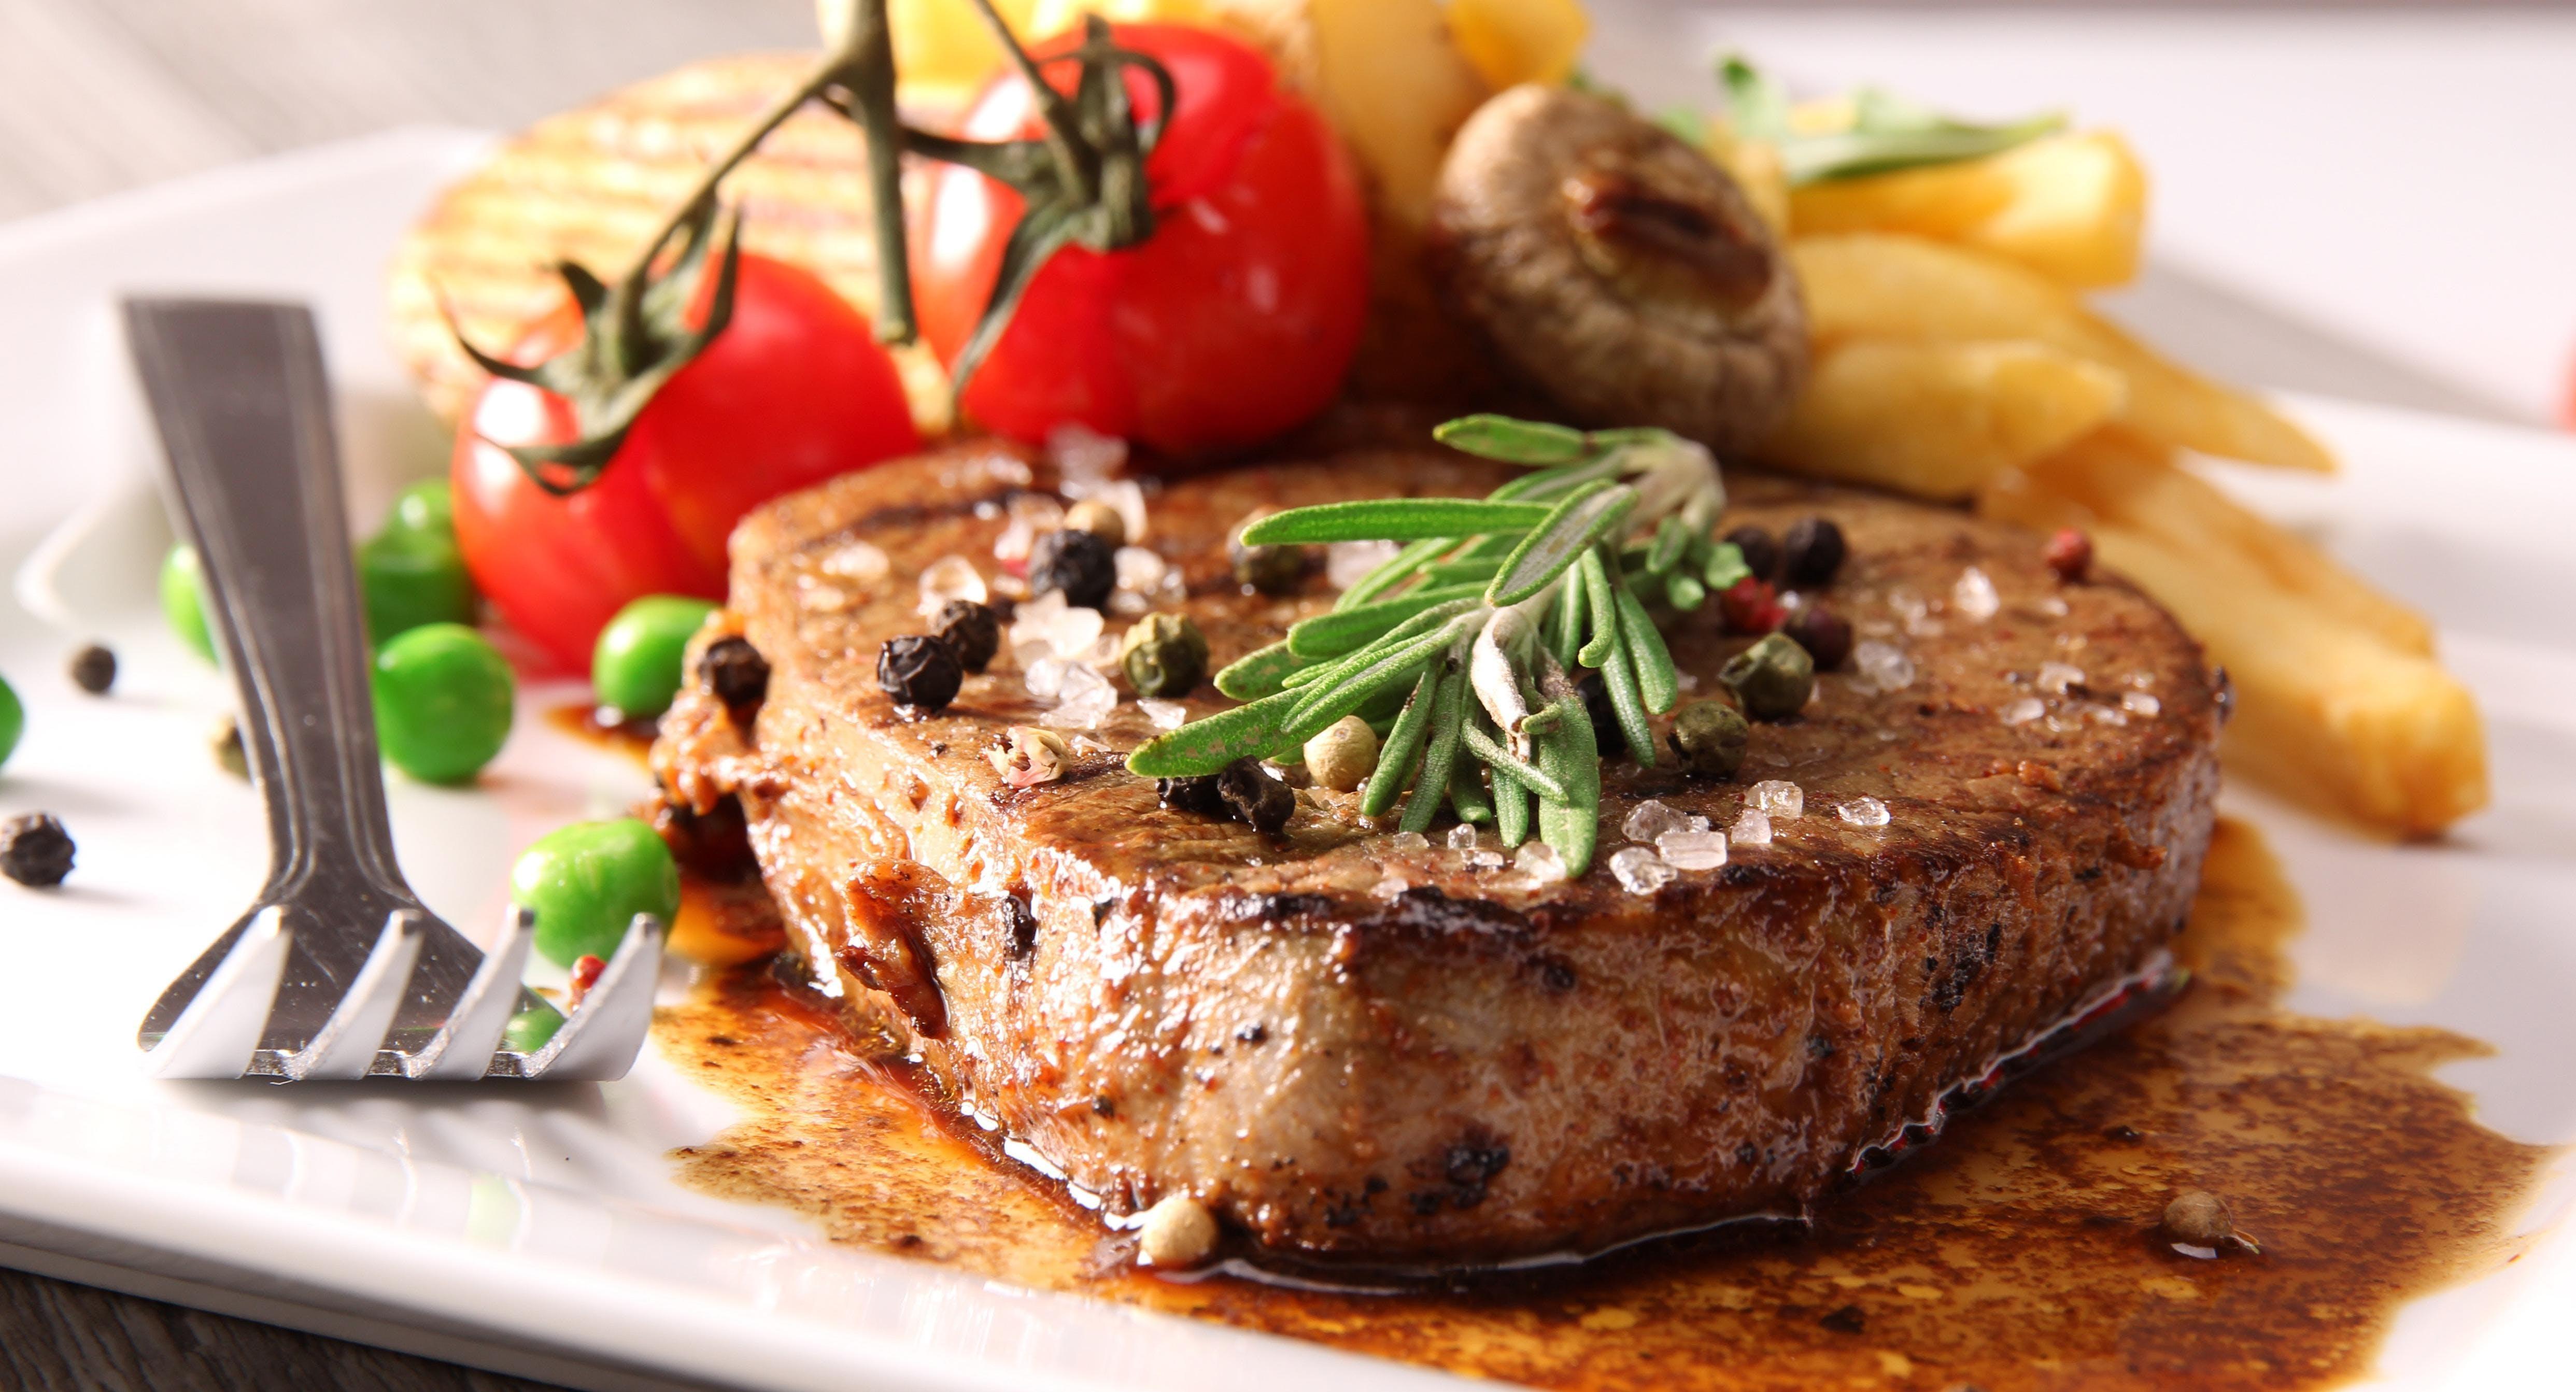 House of Steaks